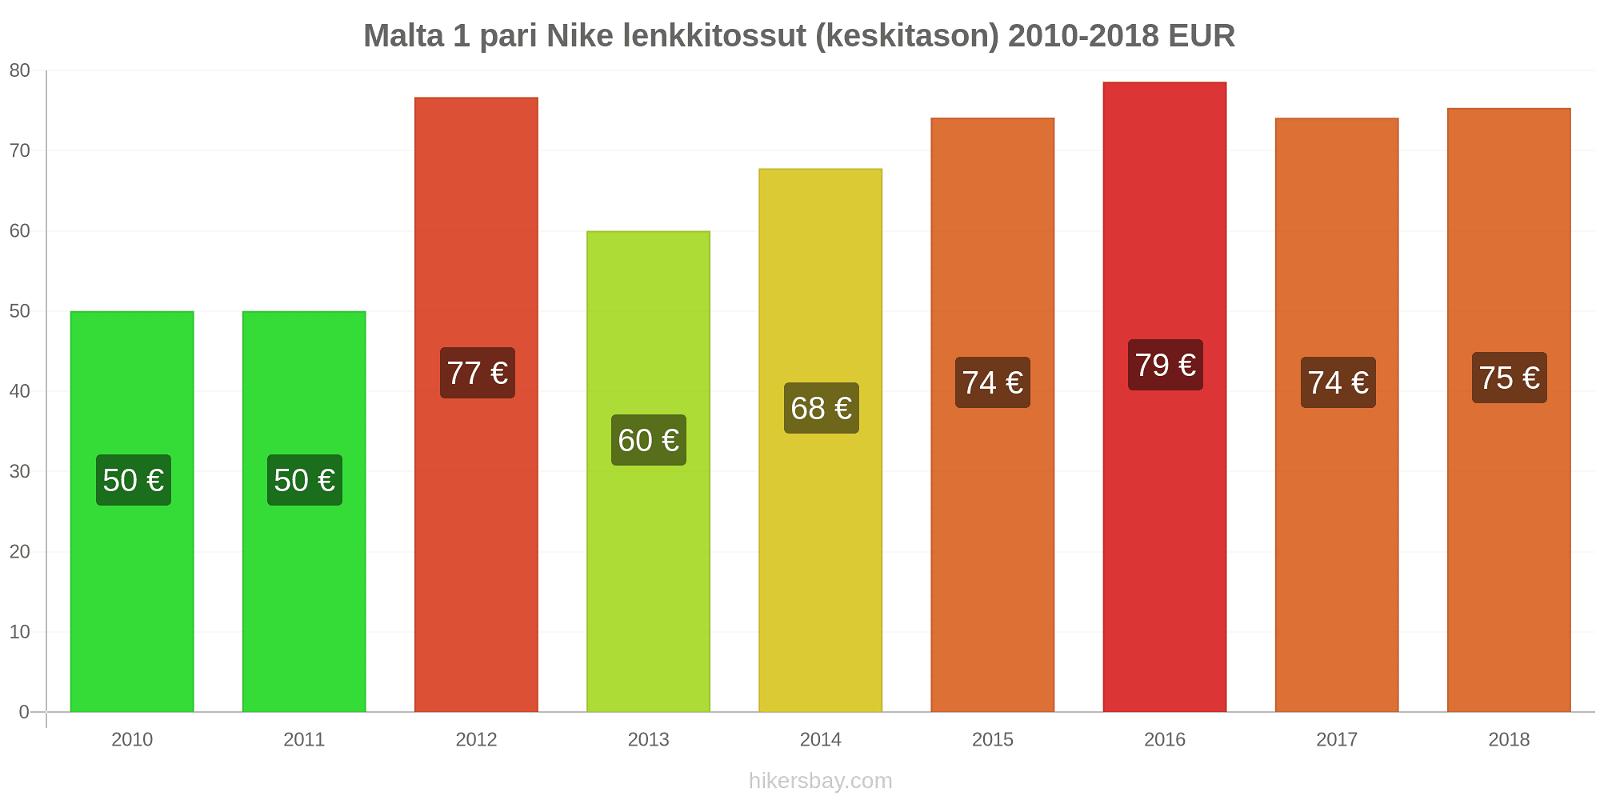 Malta hintojen muutokset 1 pari Nike lenkkitossut (keskitason) hikersbay.com